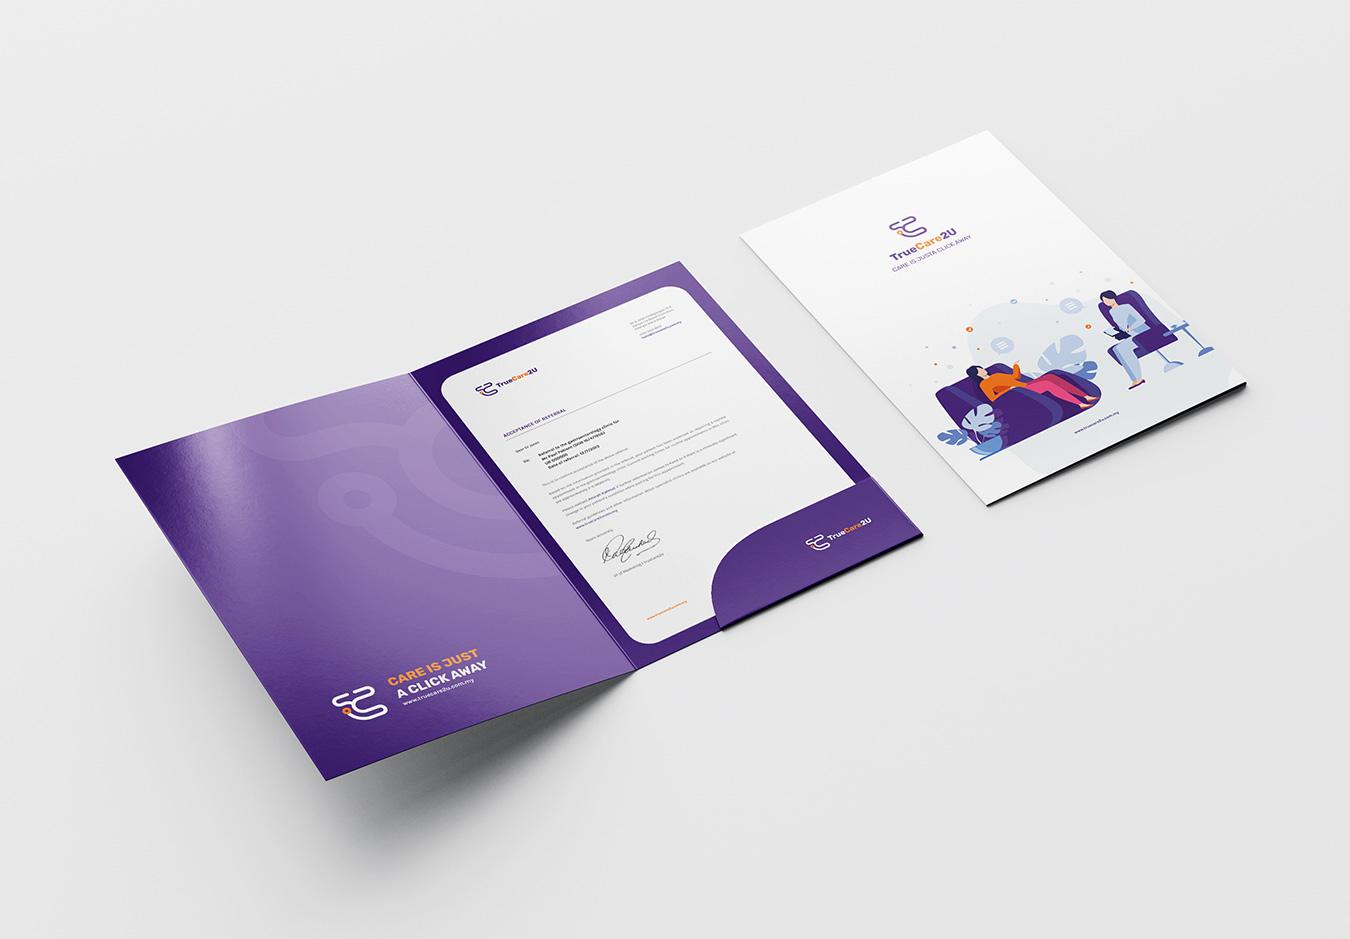 TrueCare2U - Folder Design